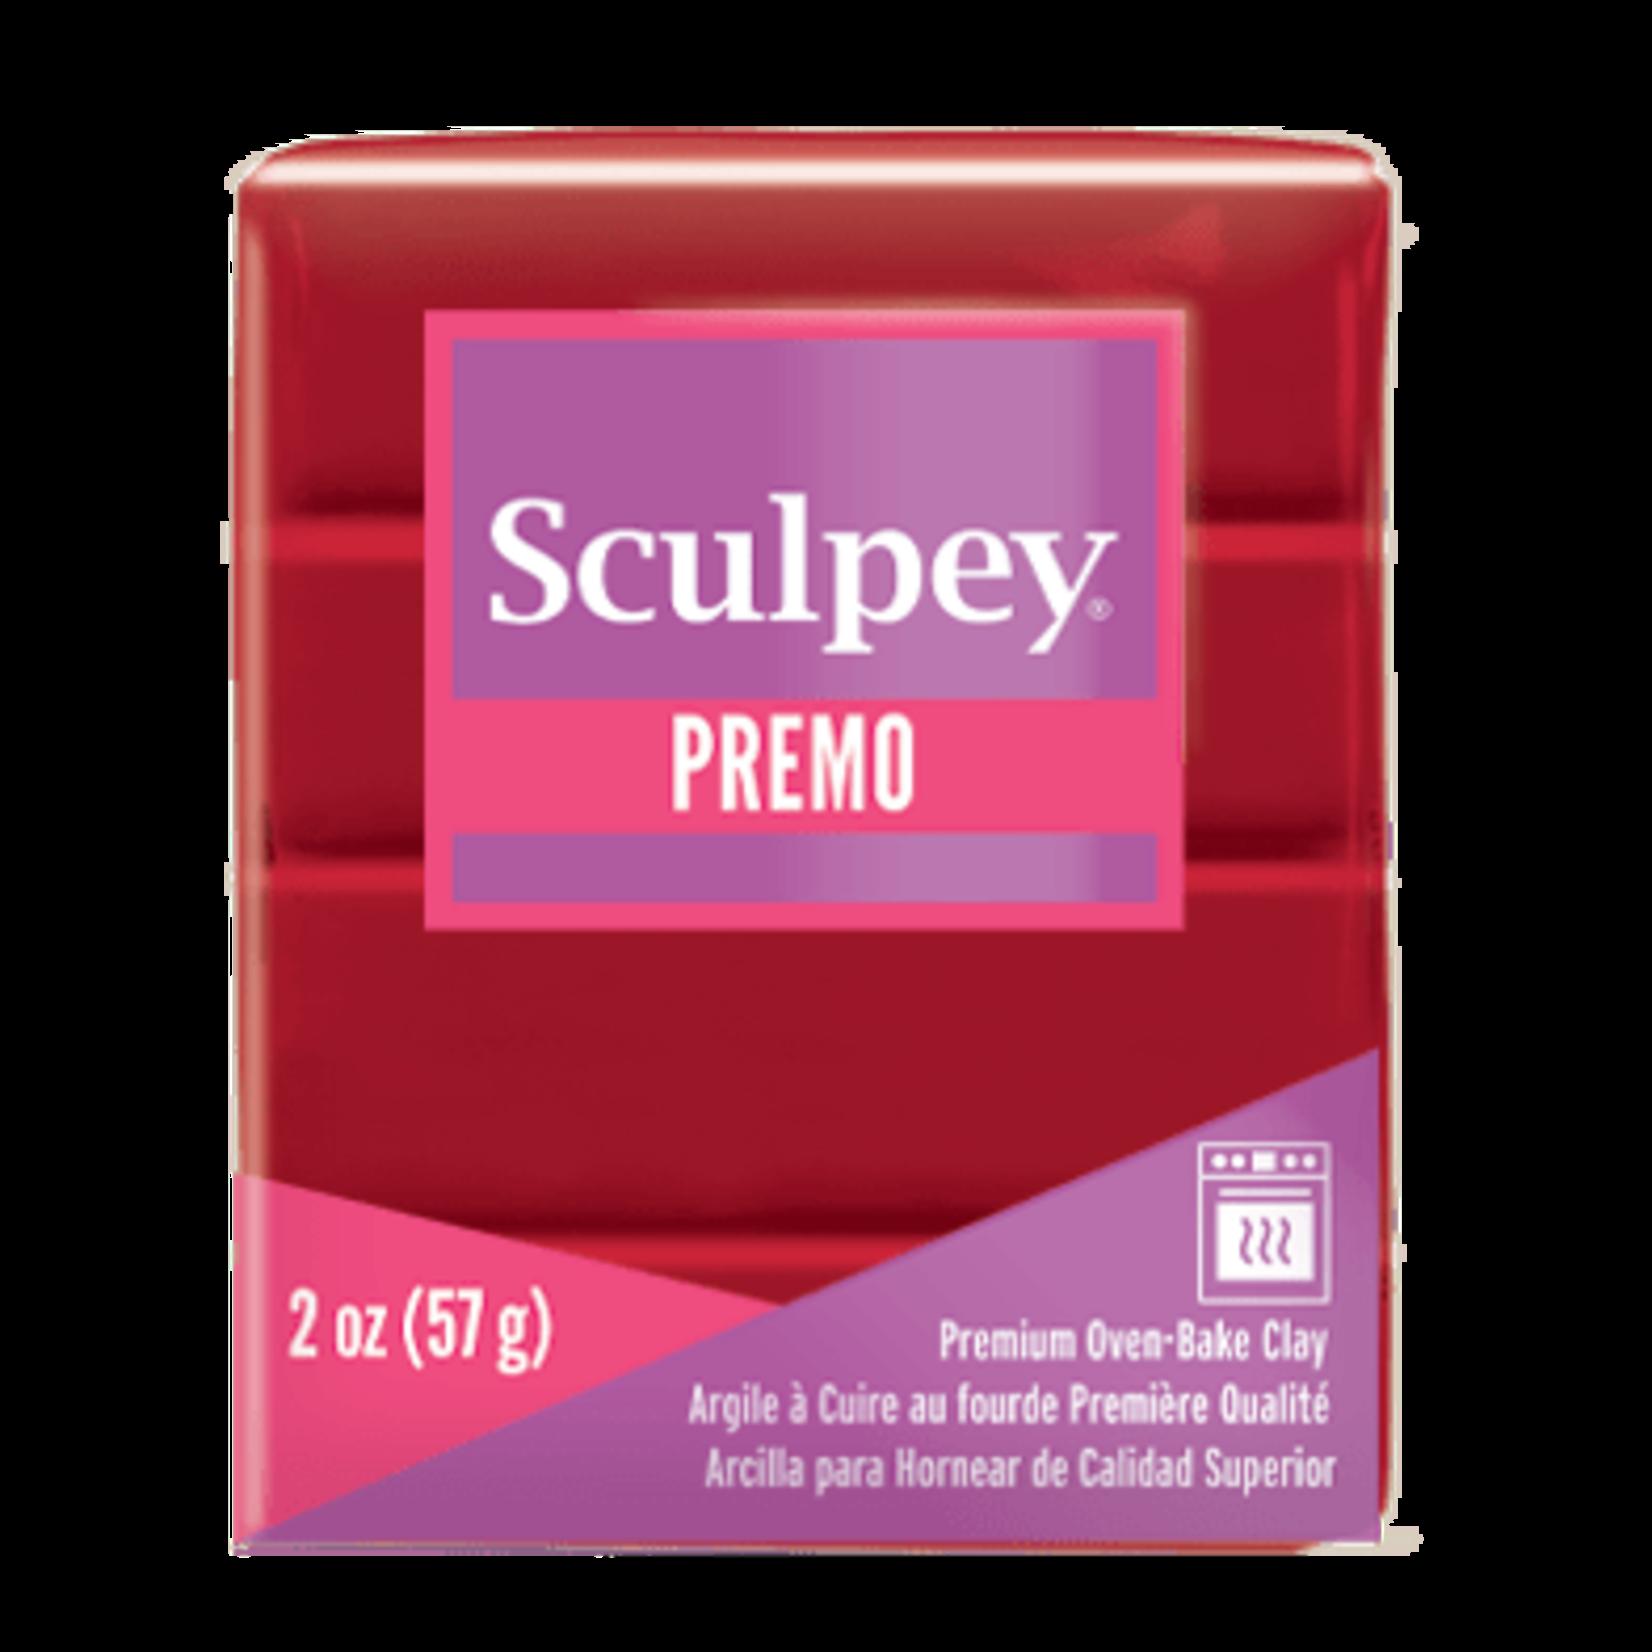 Sculpey Sculpey Premo  -- Cayenne